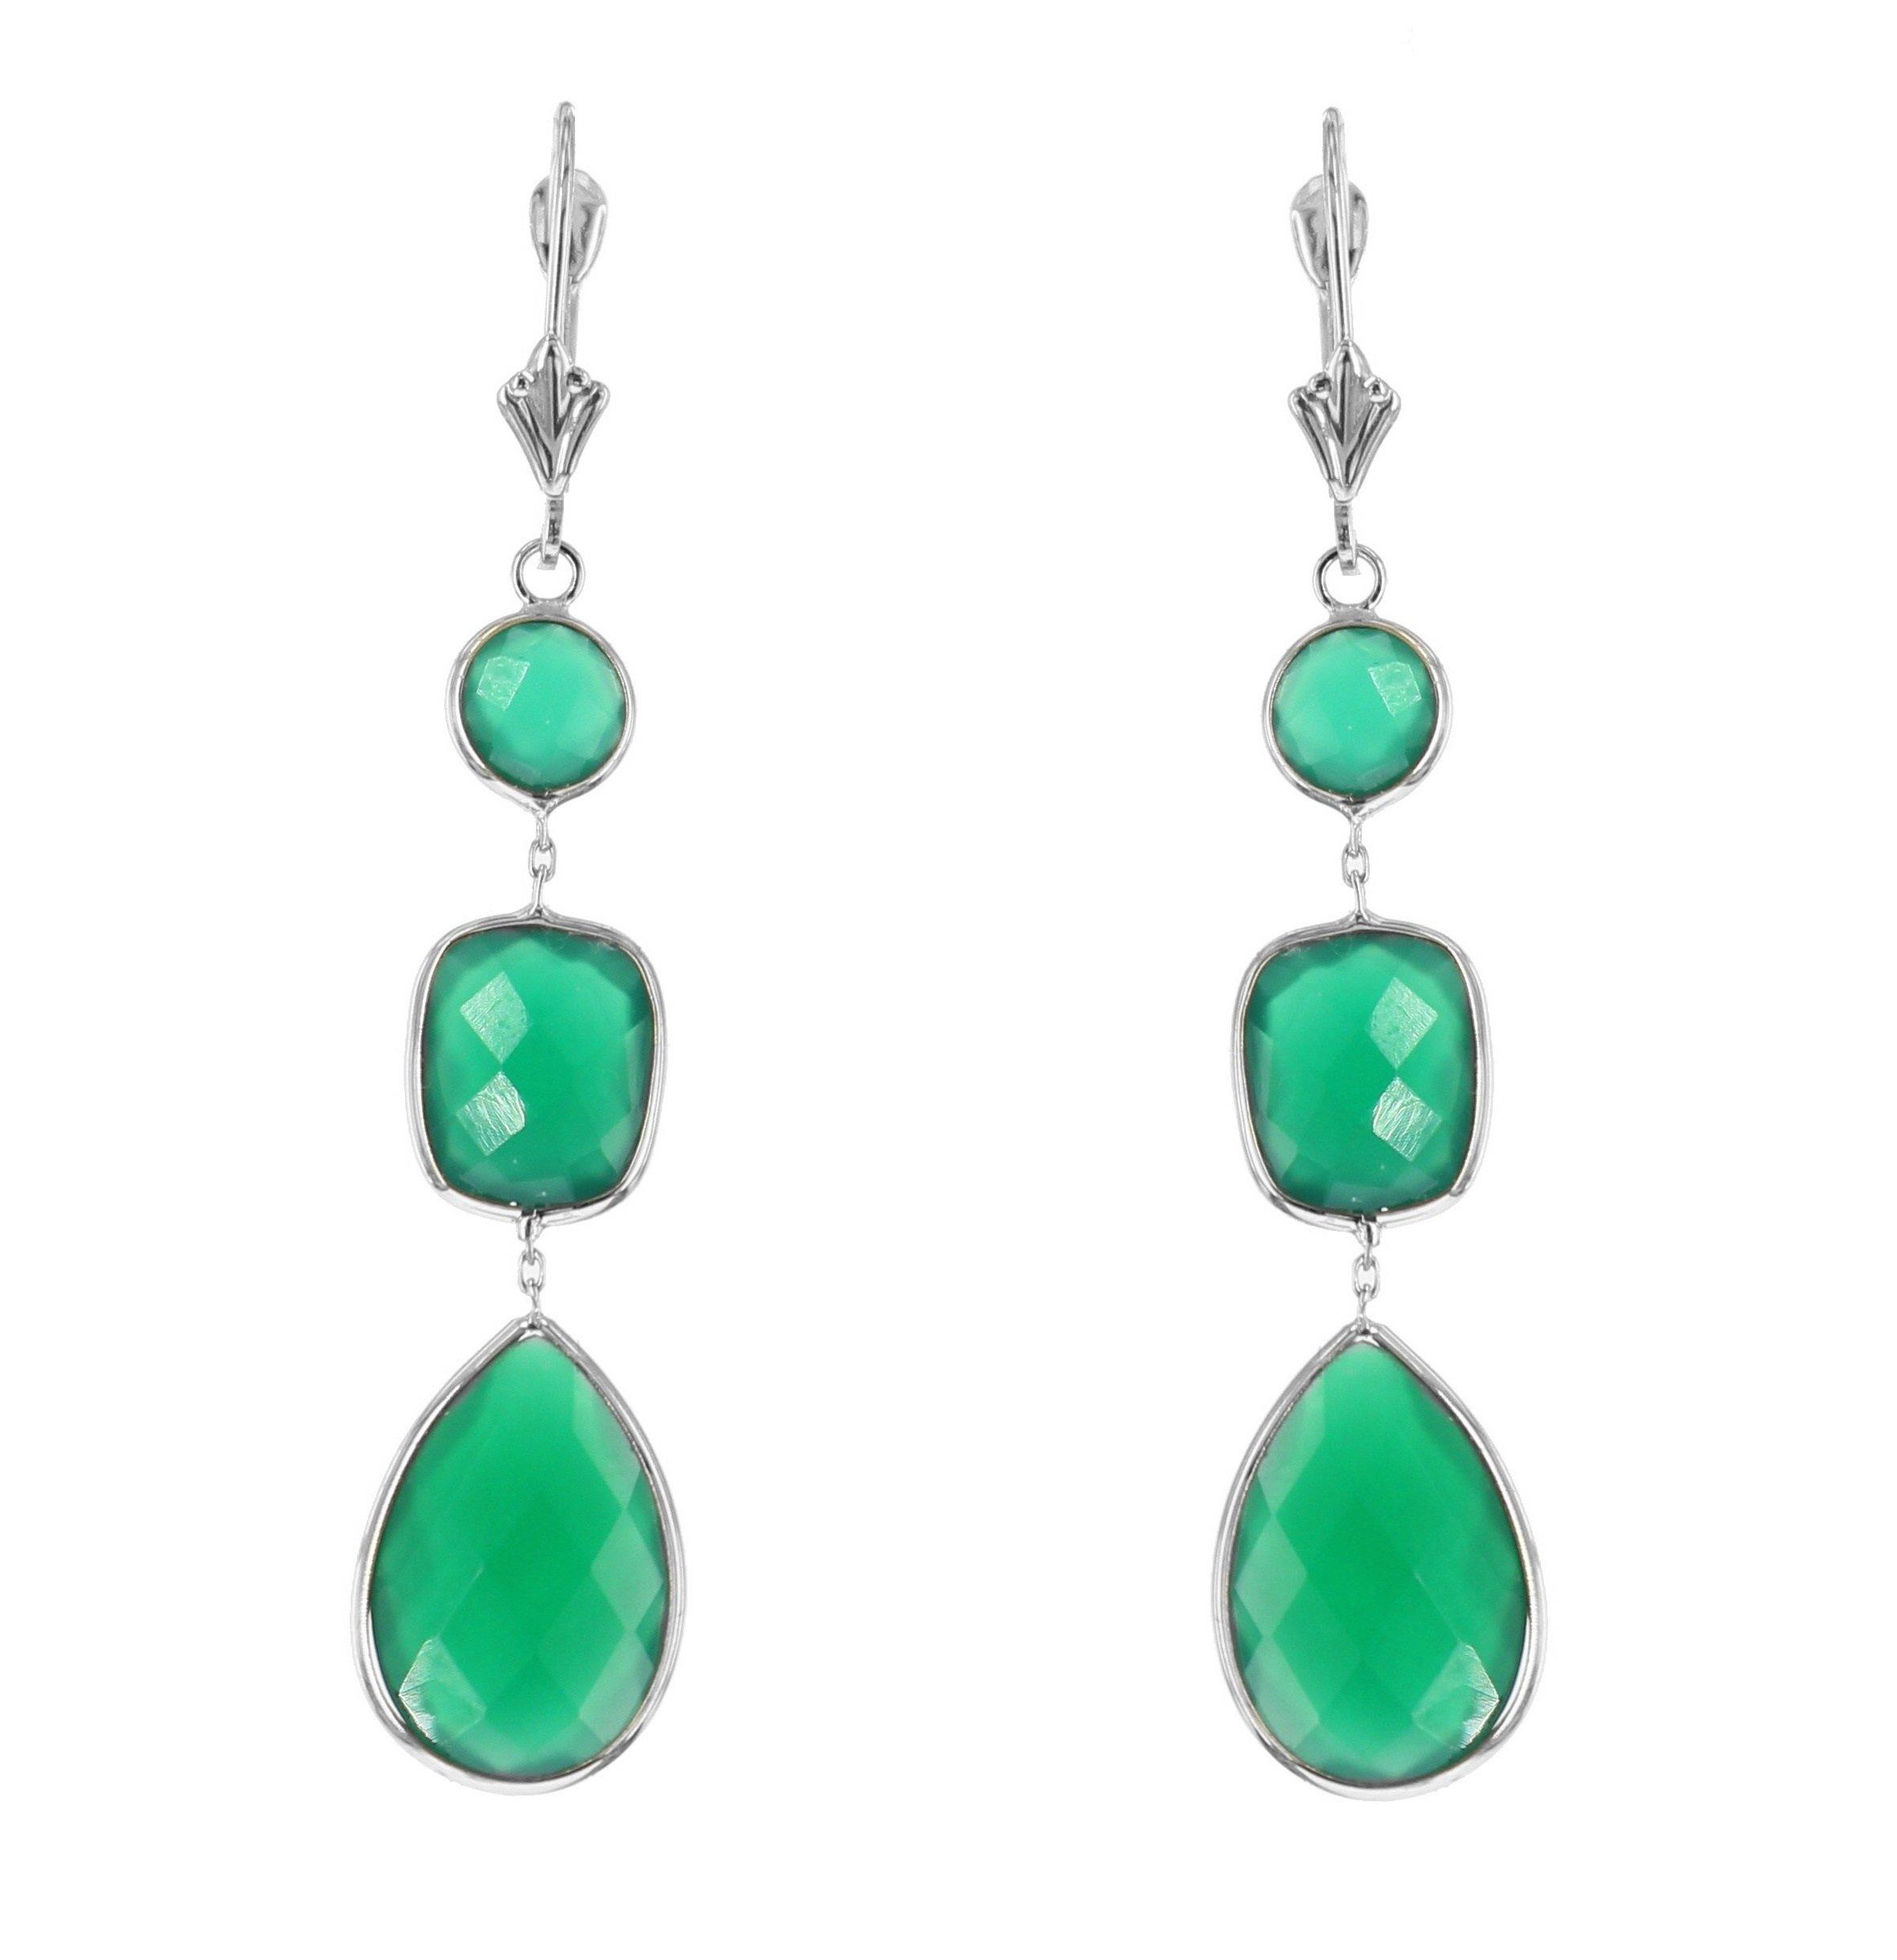 14k White Gold Gemstone Earrings With Dangling Green Onyx